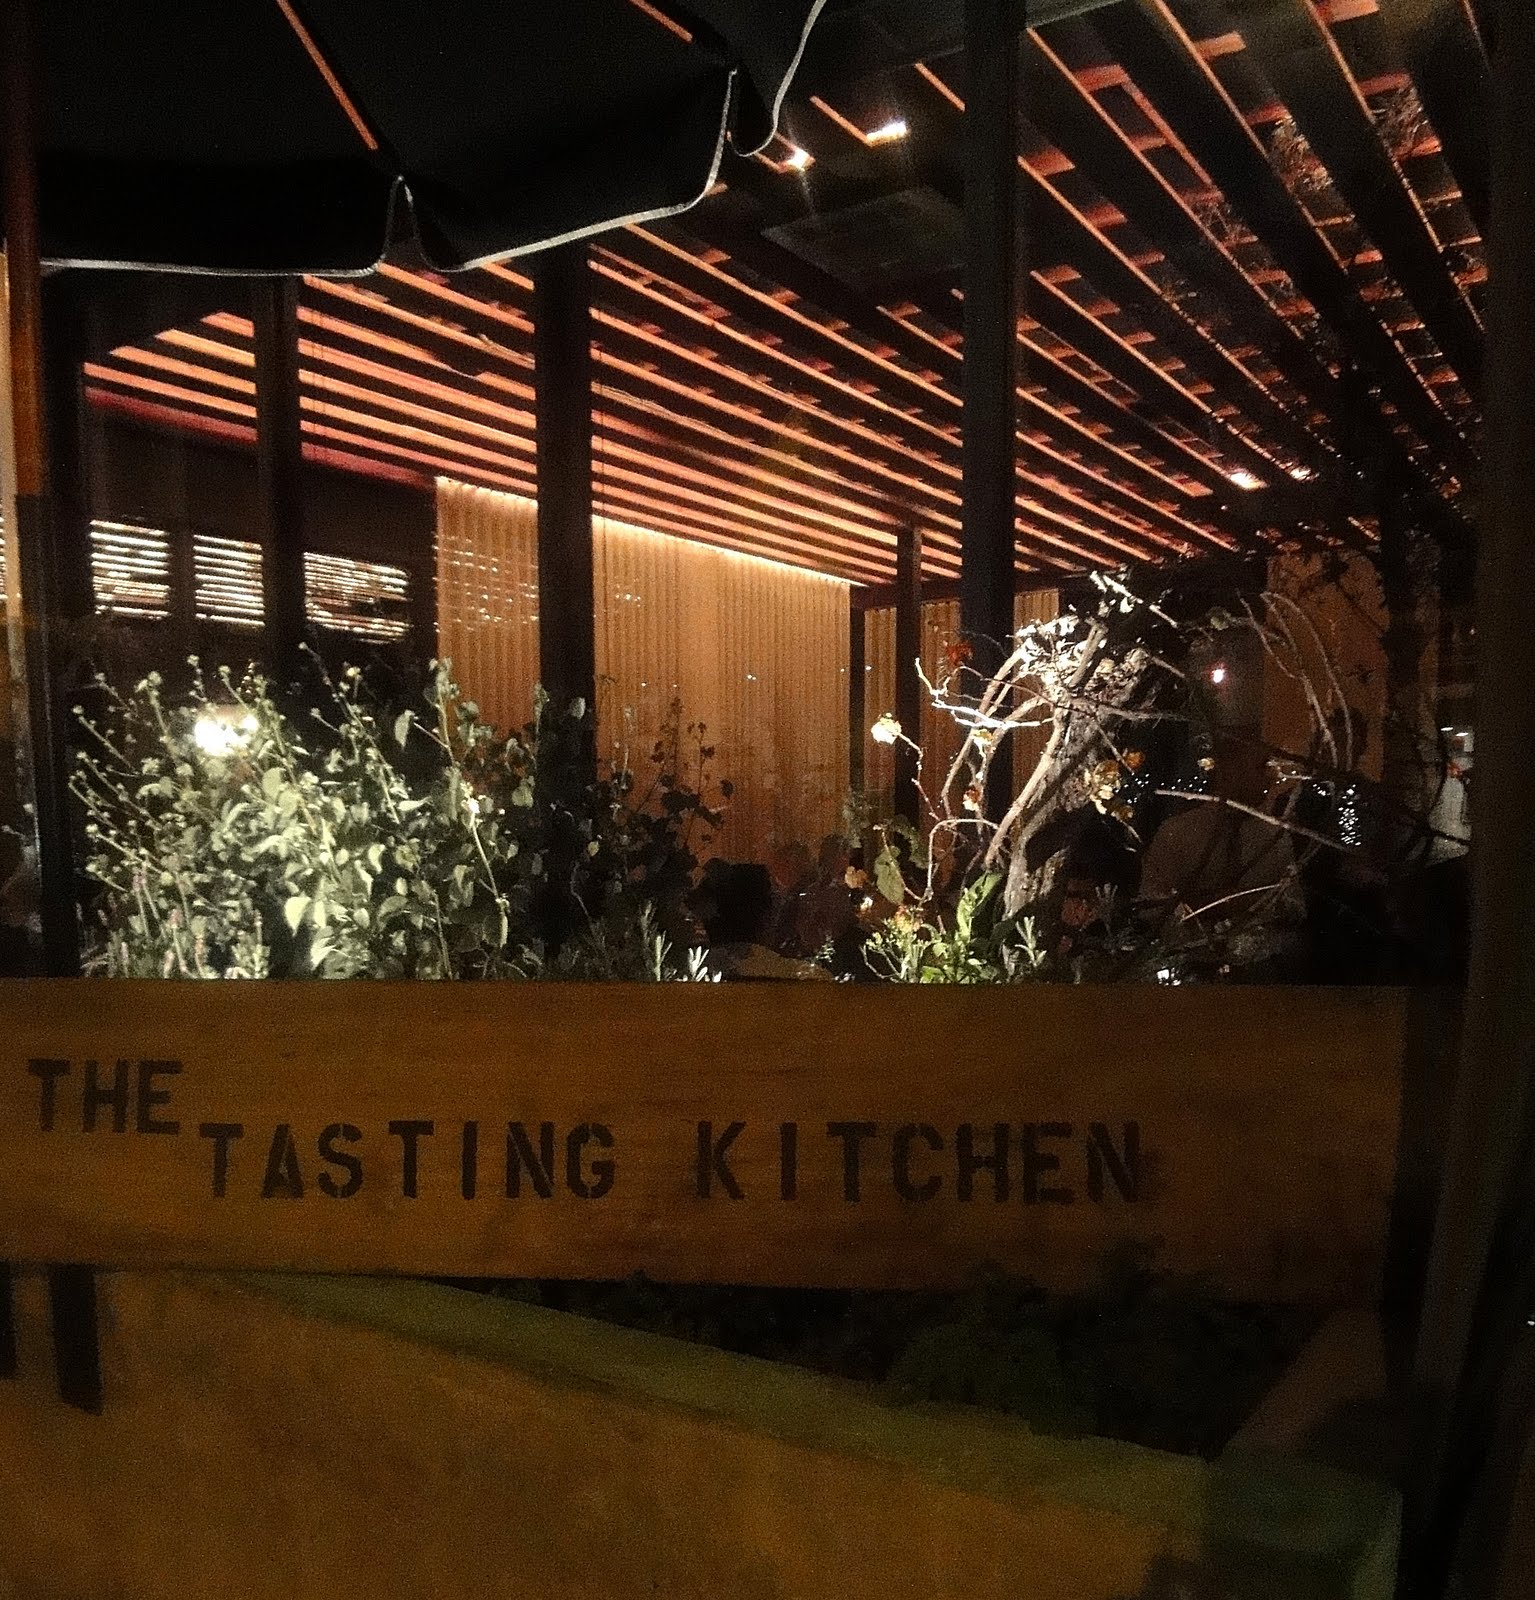 Diana Takes a Bite: The Tasting Kitchen: A new way to taste